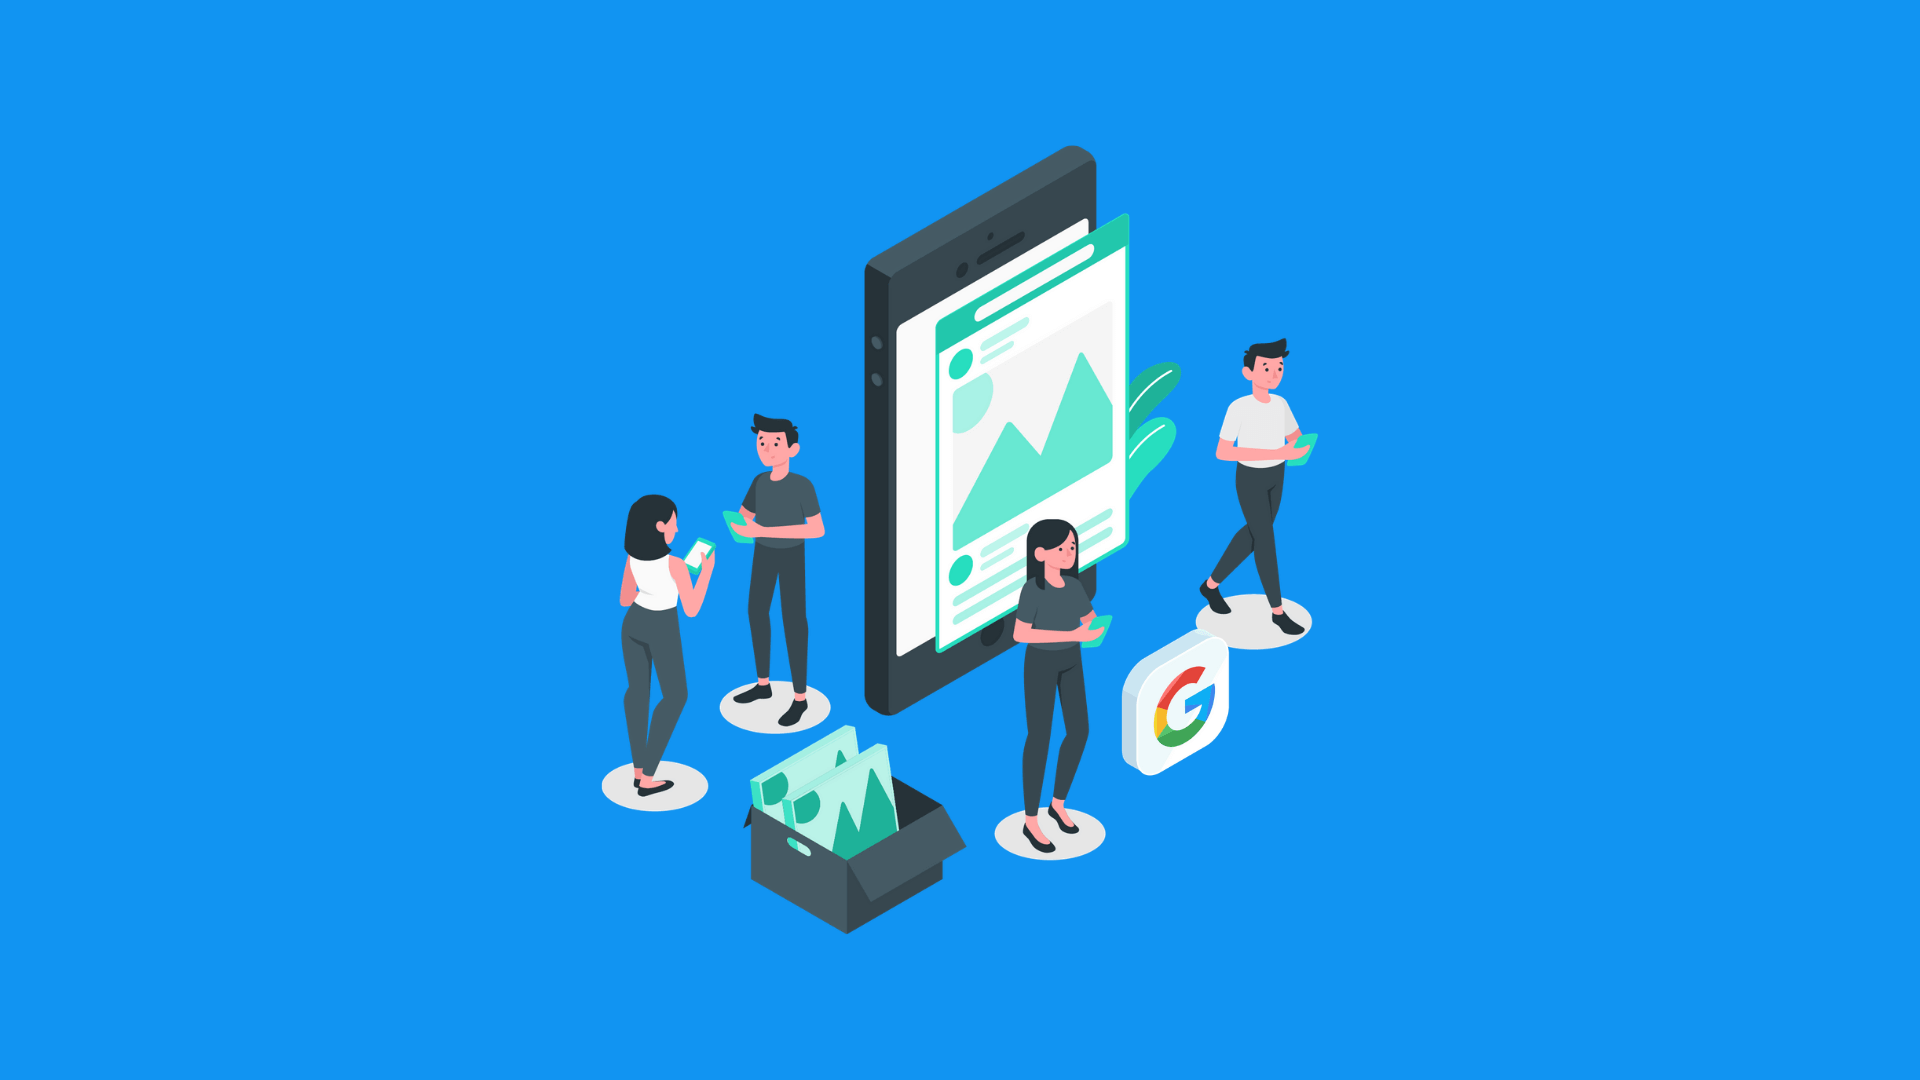 Cara Menyimpan Gambar Dari Google Ke Galeri Hp Di 2020 Galeri Gambar Kreatif